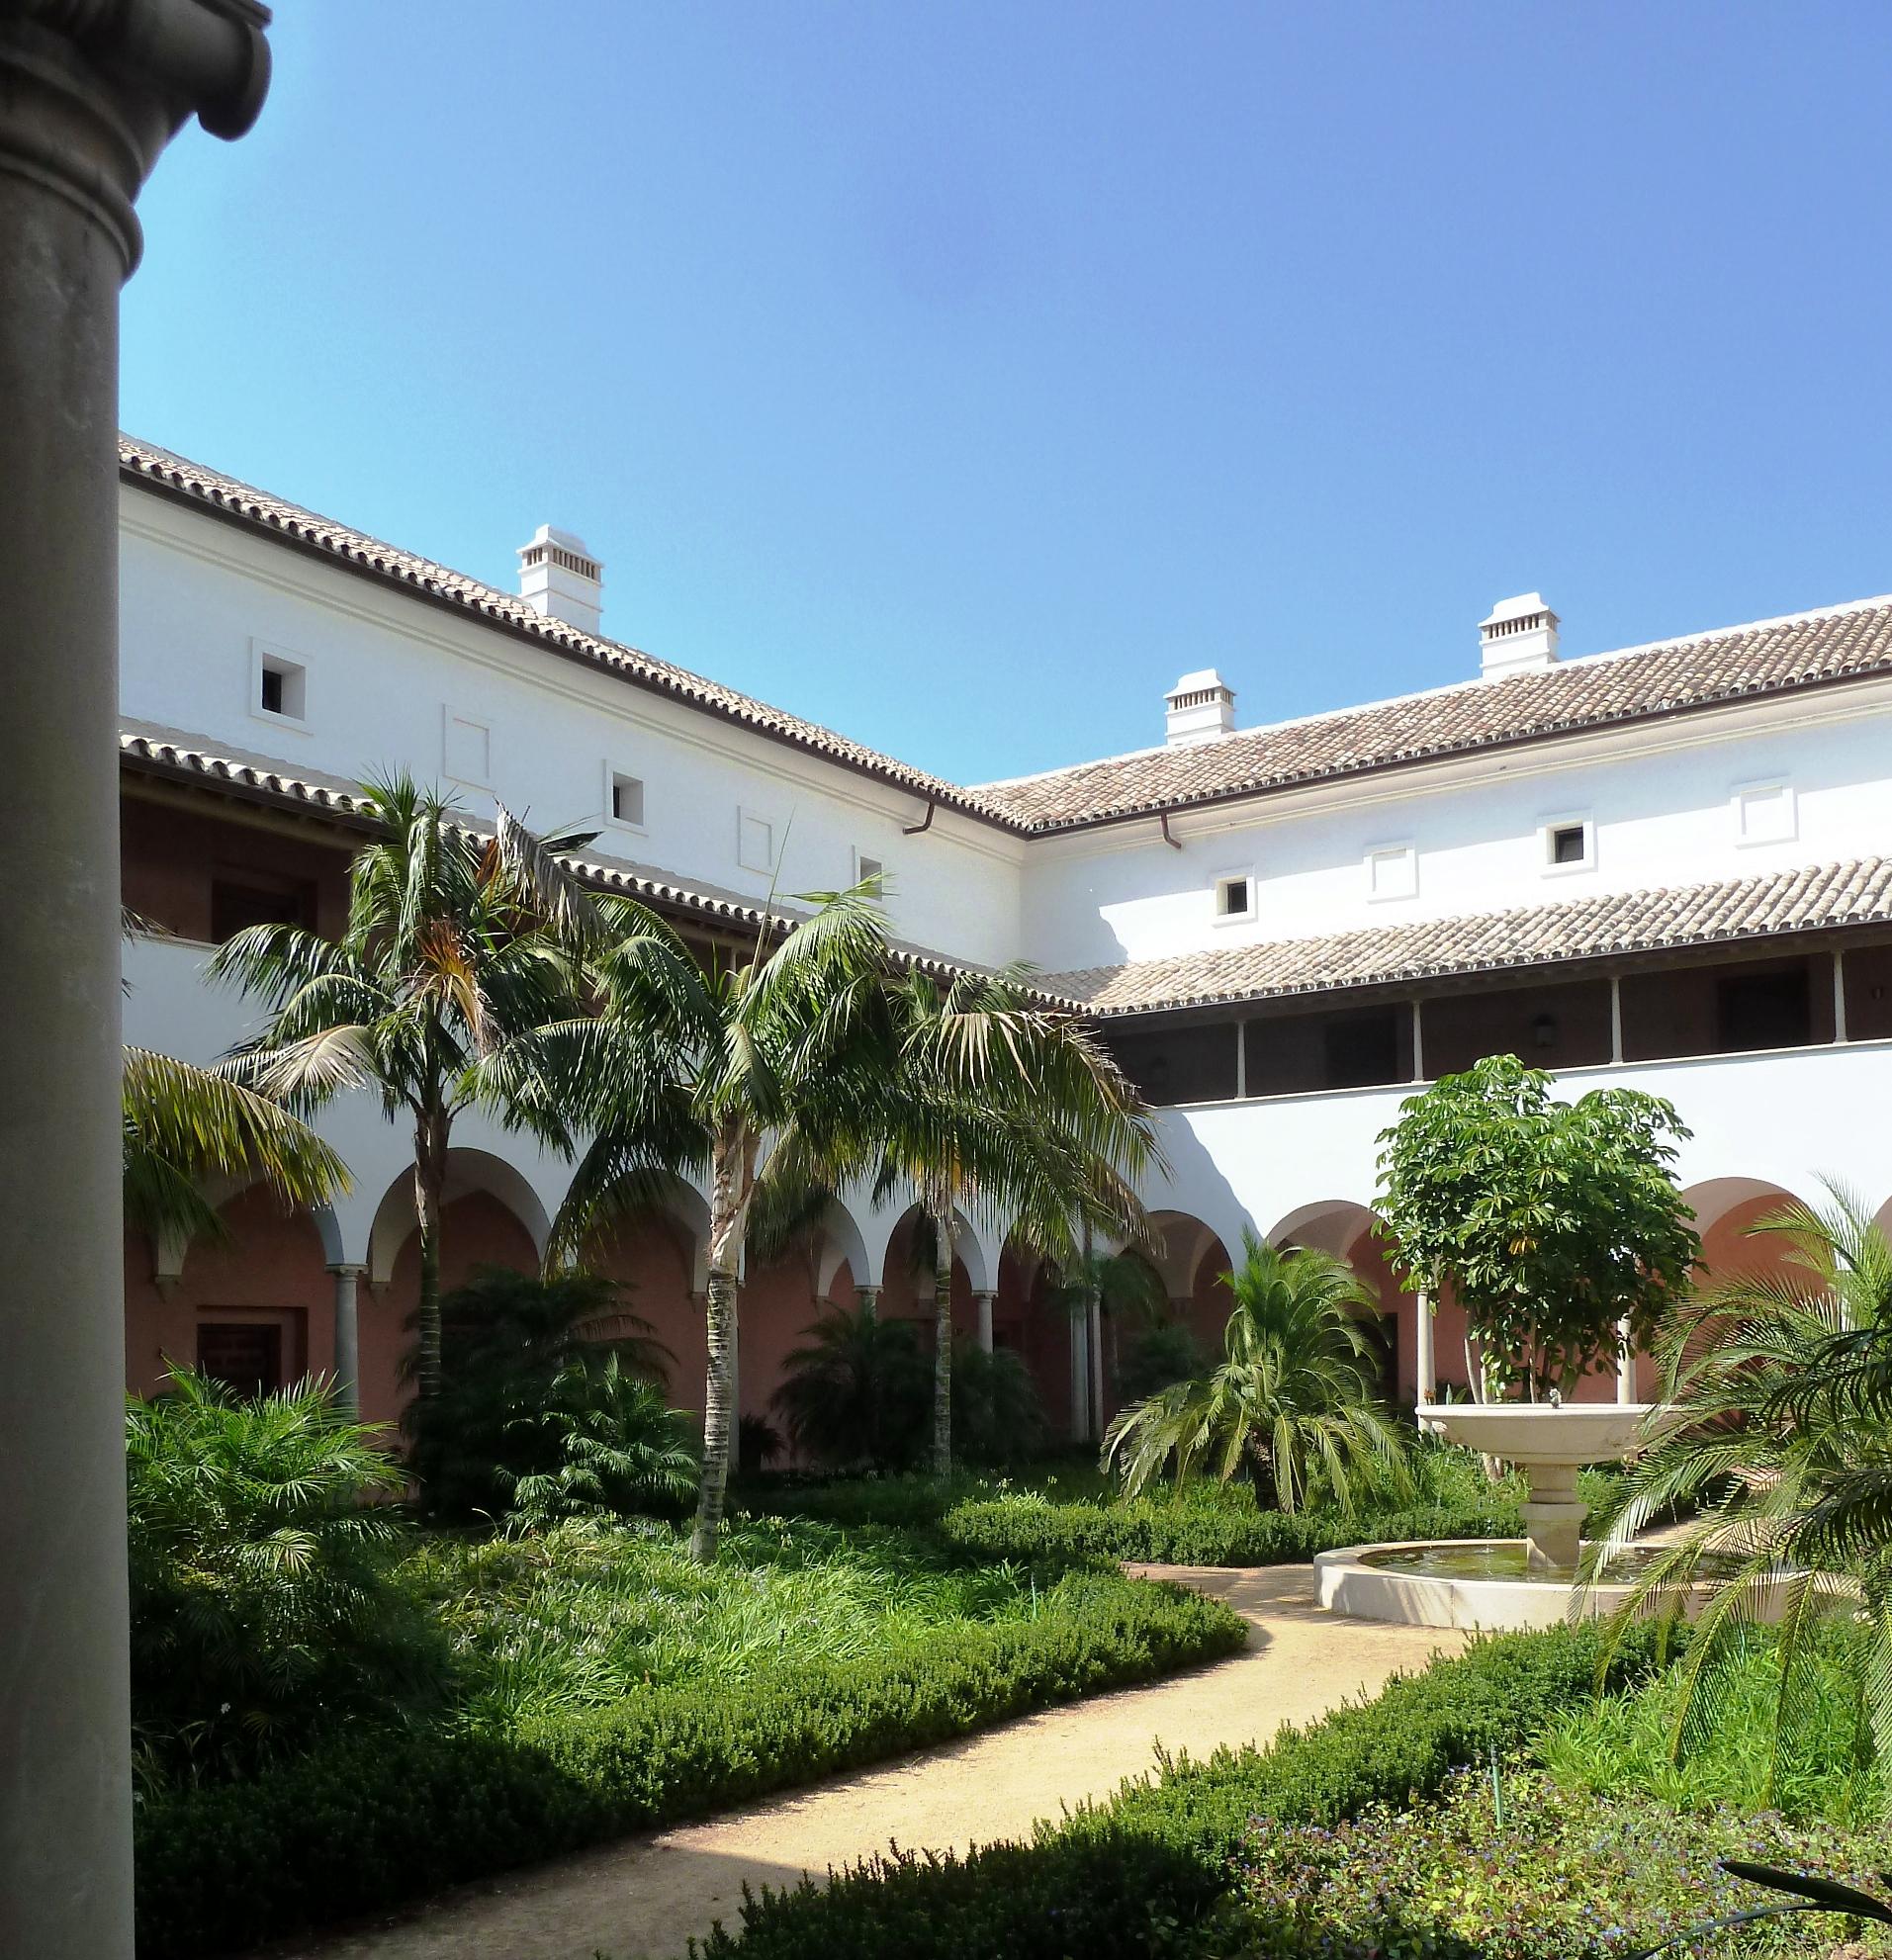 Andaluz_patio_cloisters__Hotel_Finca_Cortesin_Casares_copyright_www.andrewforbes.com